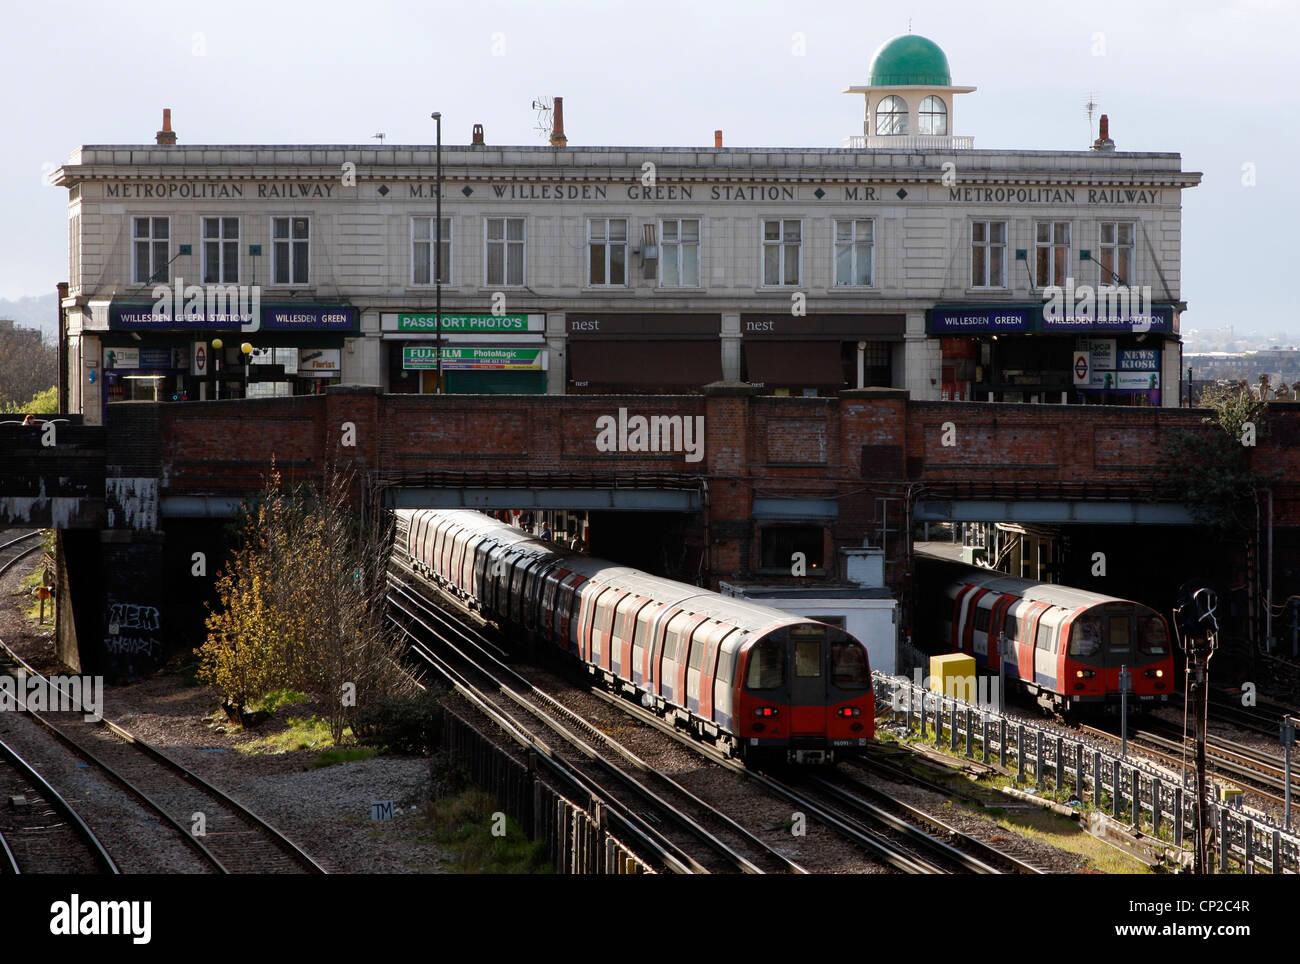 Willesden Green London Underground Station - Stock Image